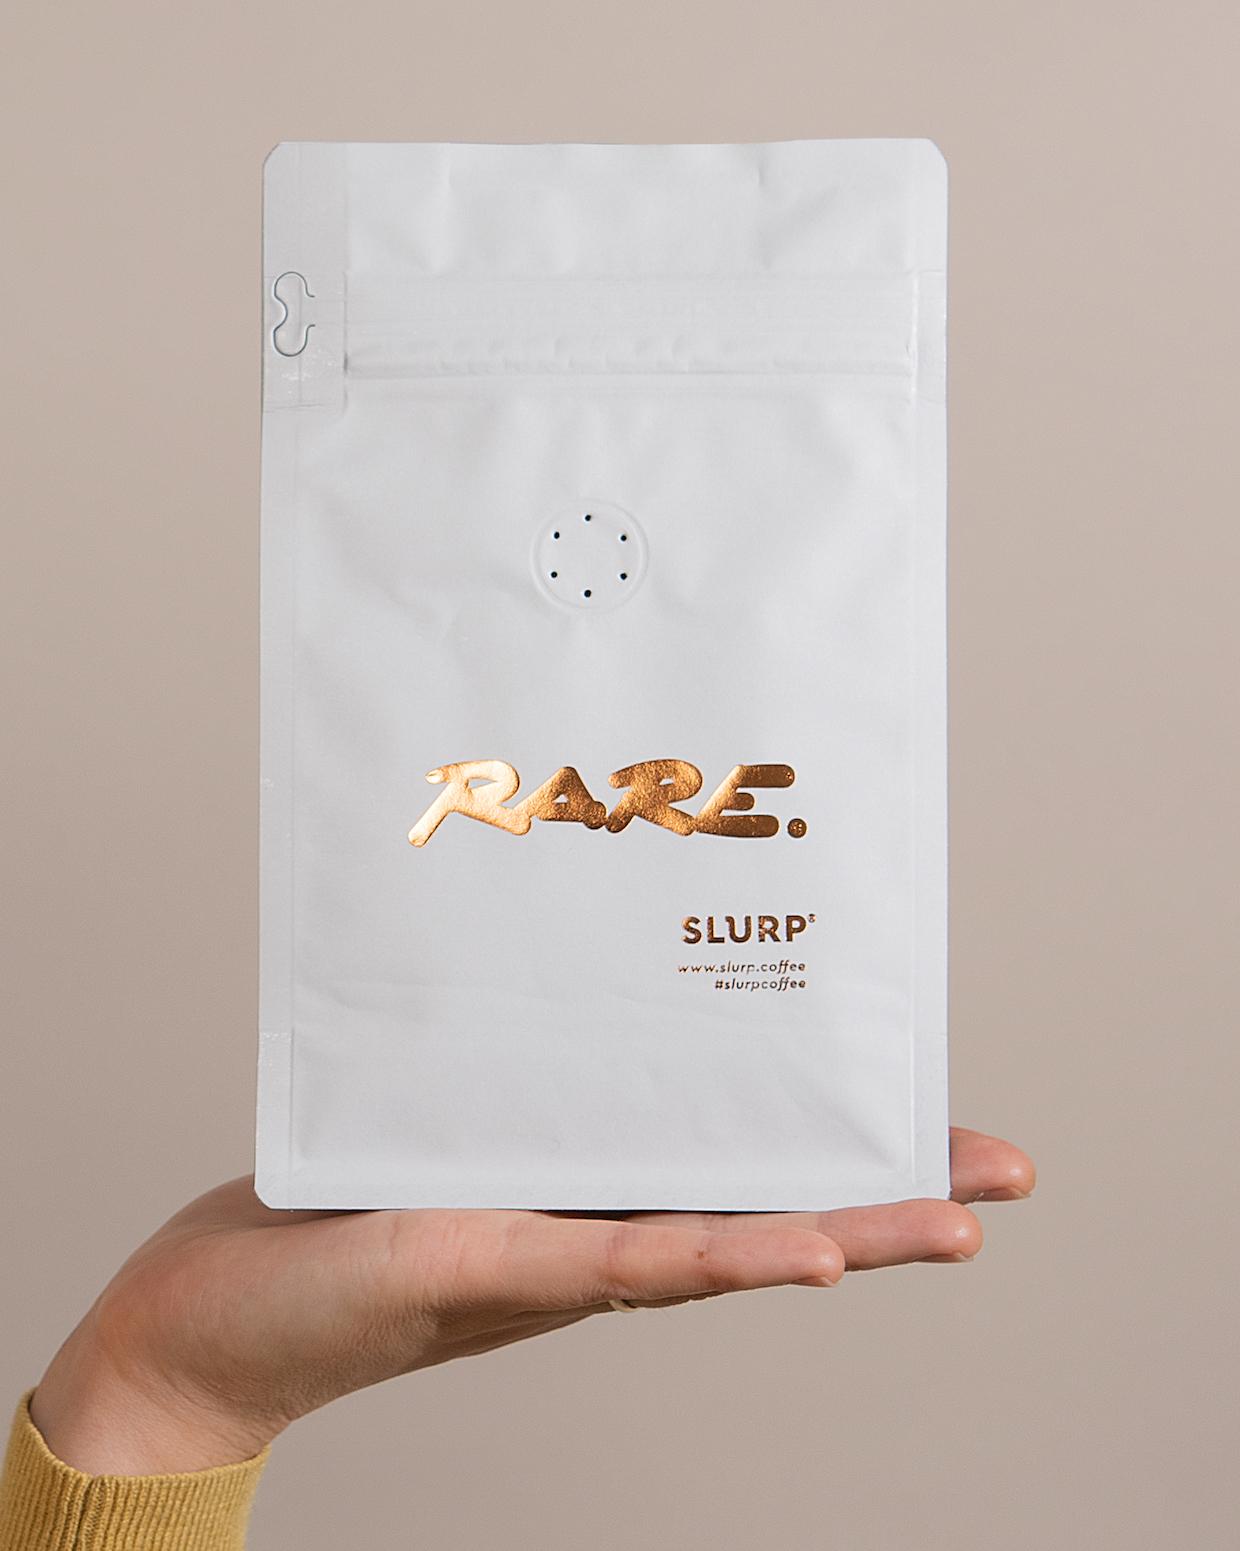 SLURP-rare-on-hand-4-5 white